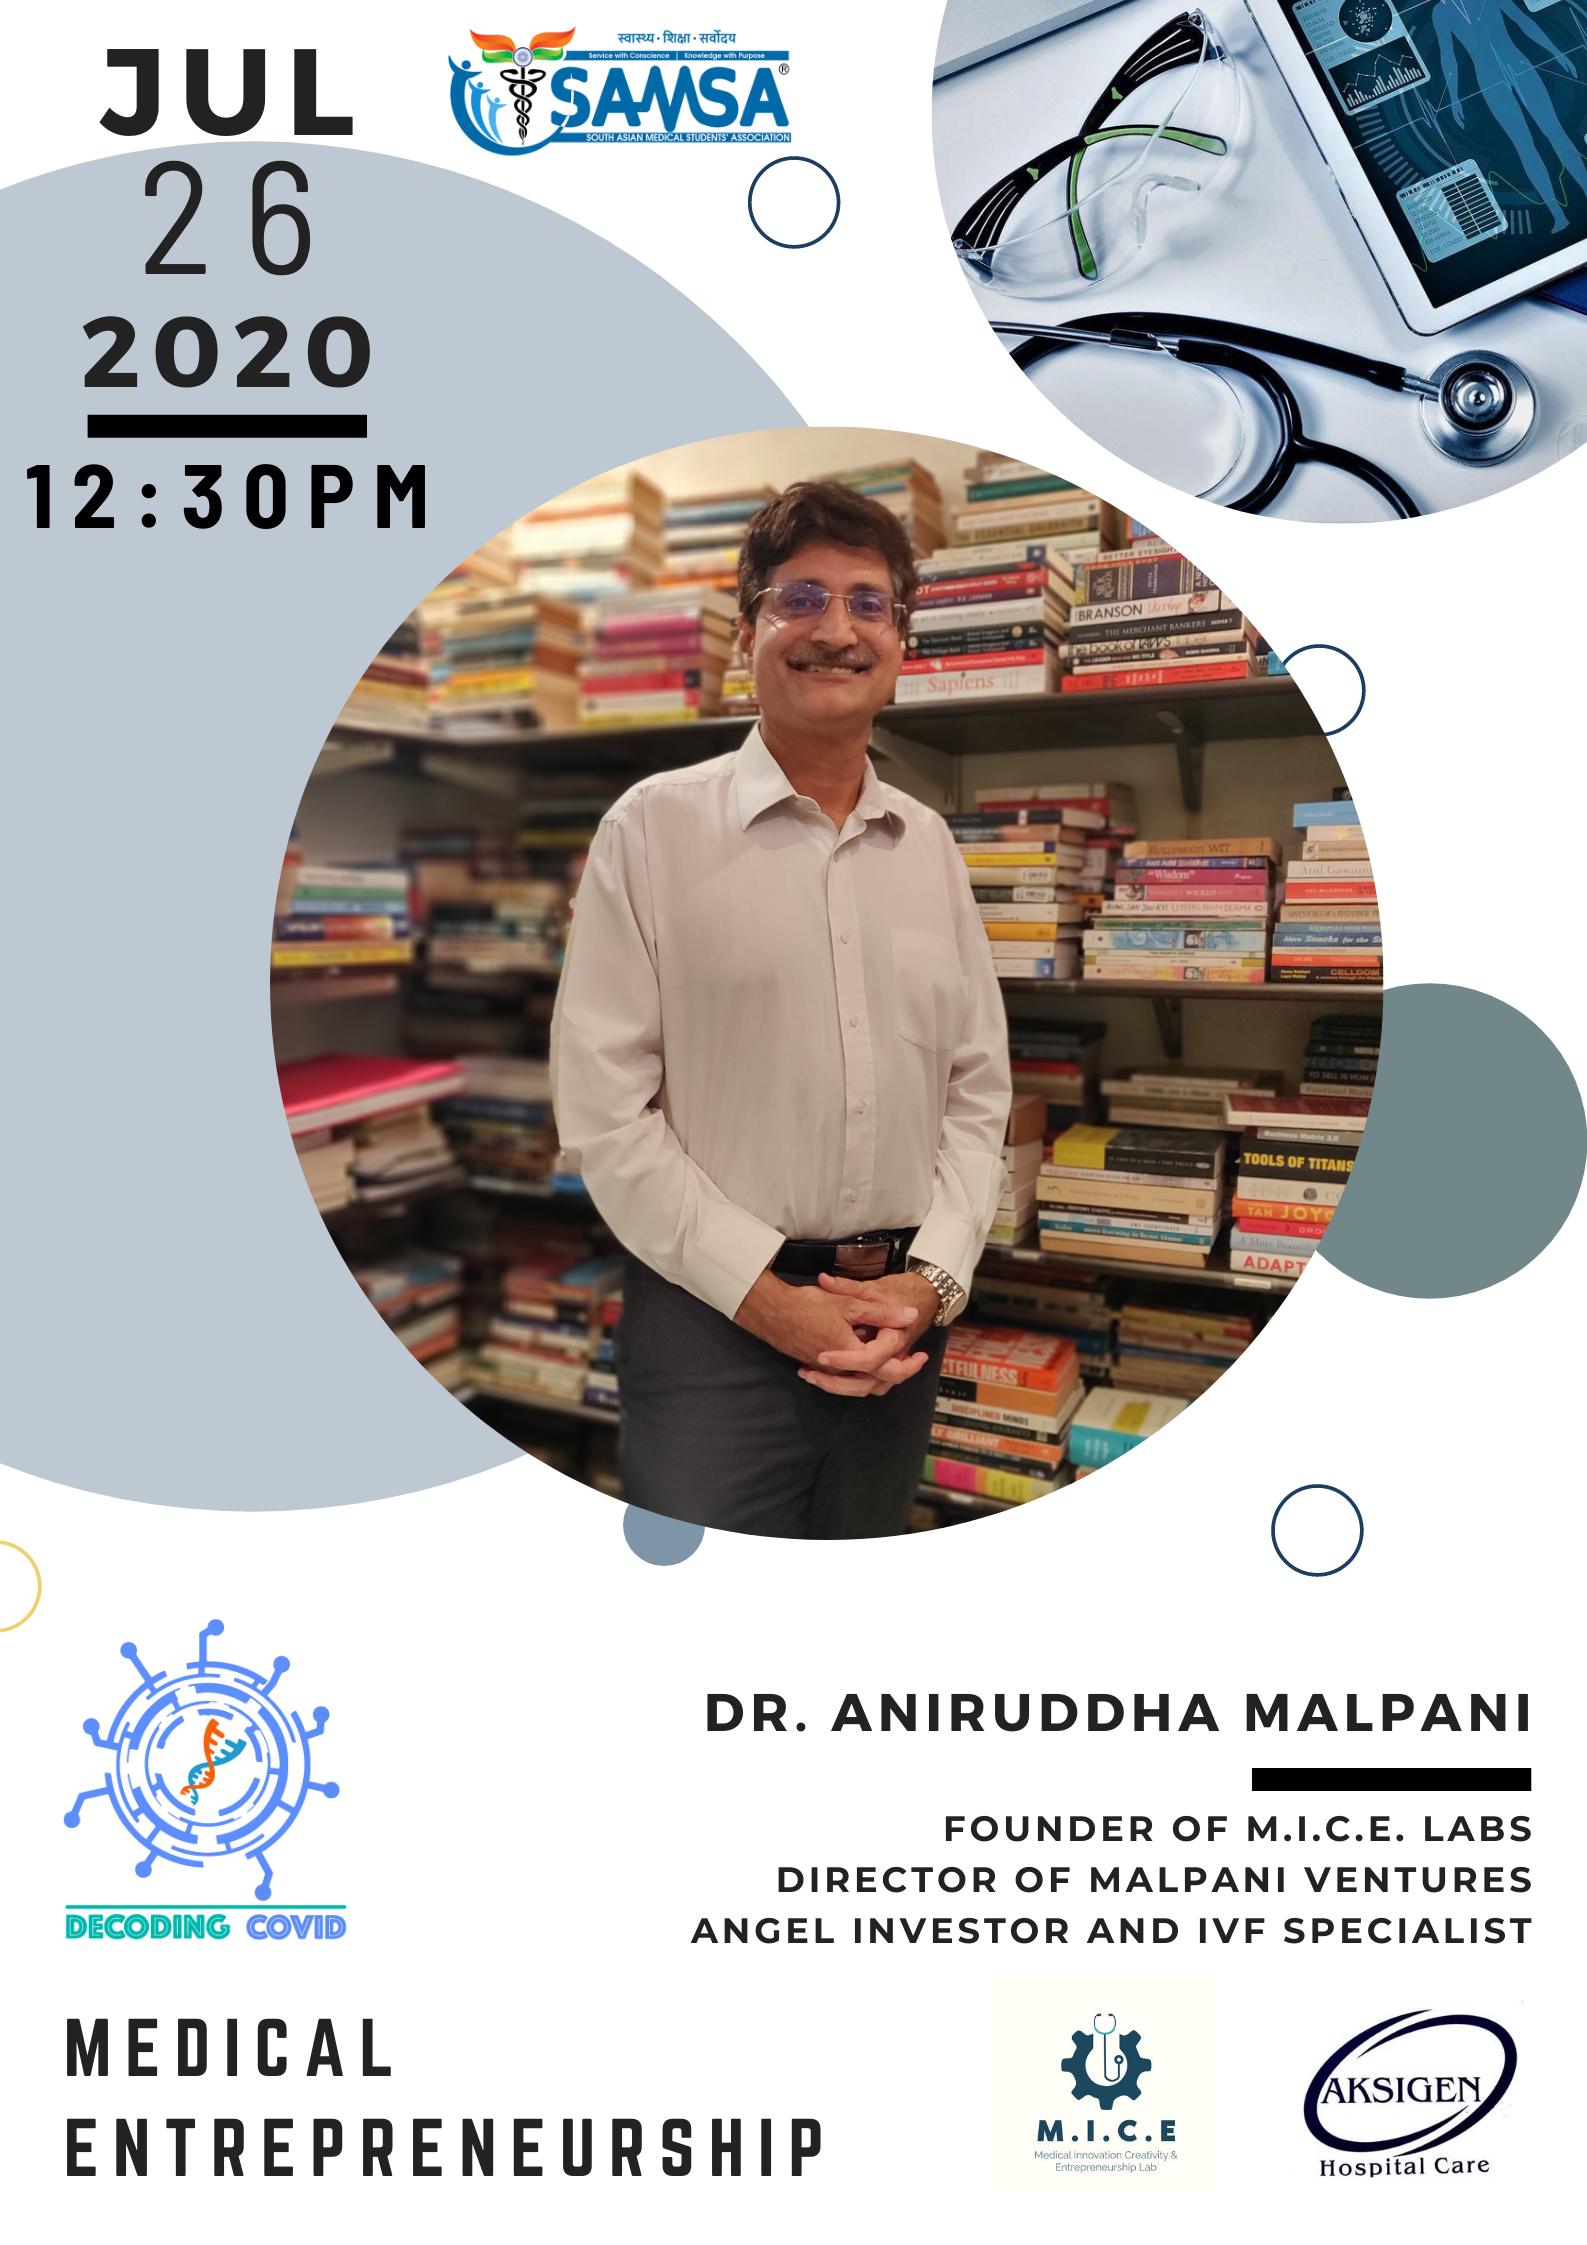 dr aniruddha